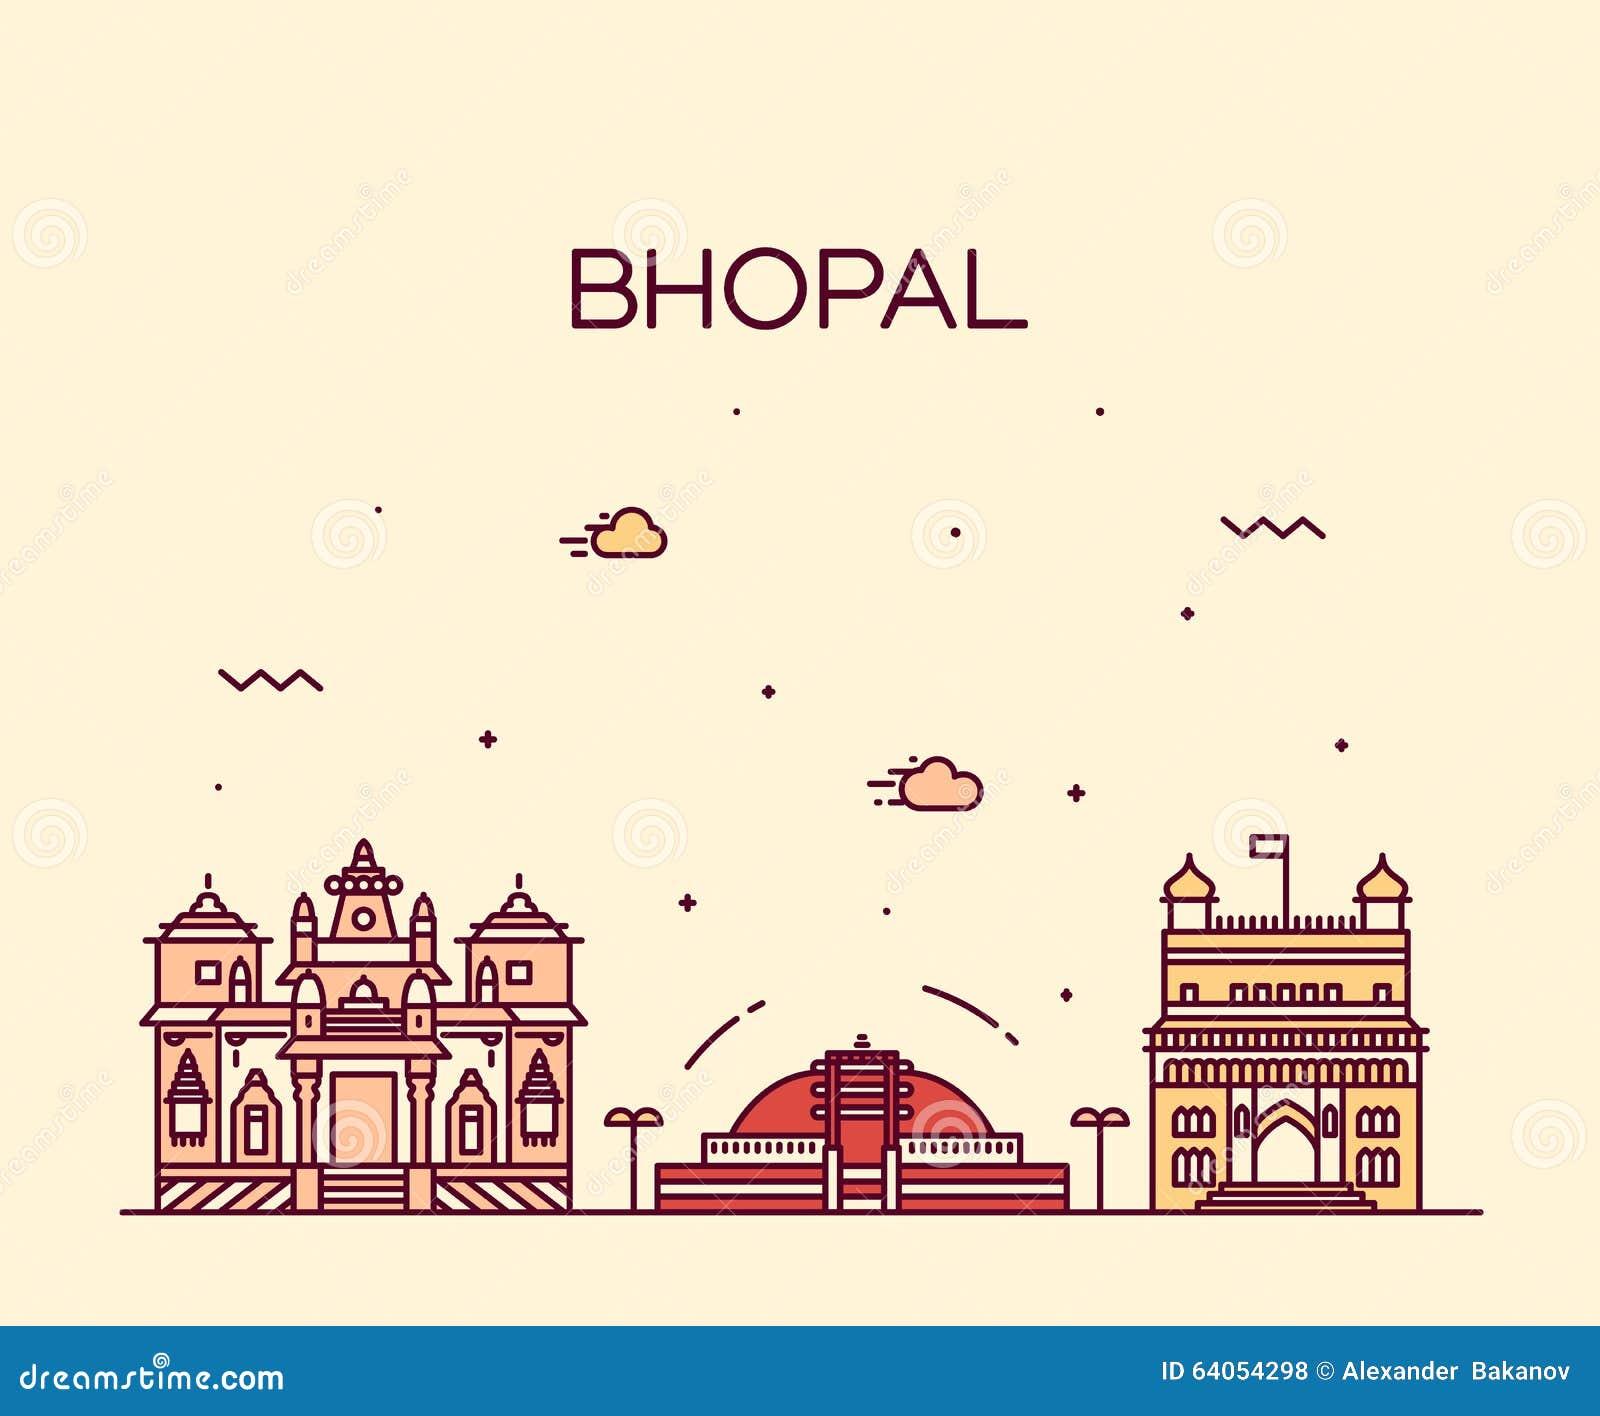 Dream Kitchen Bhopal: Bhopal Skyline Vector Illustration Linear Style Stock